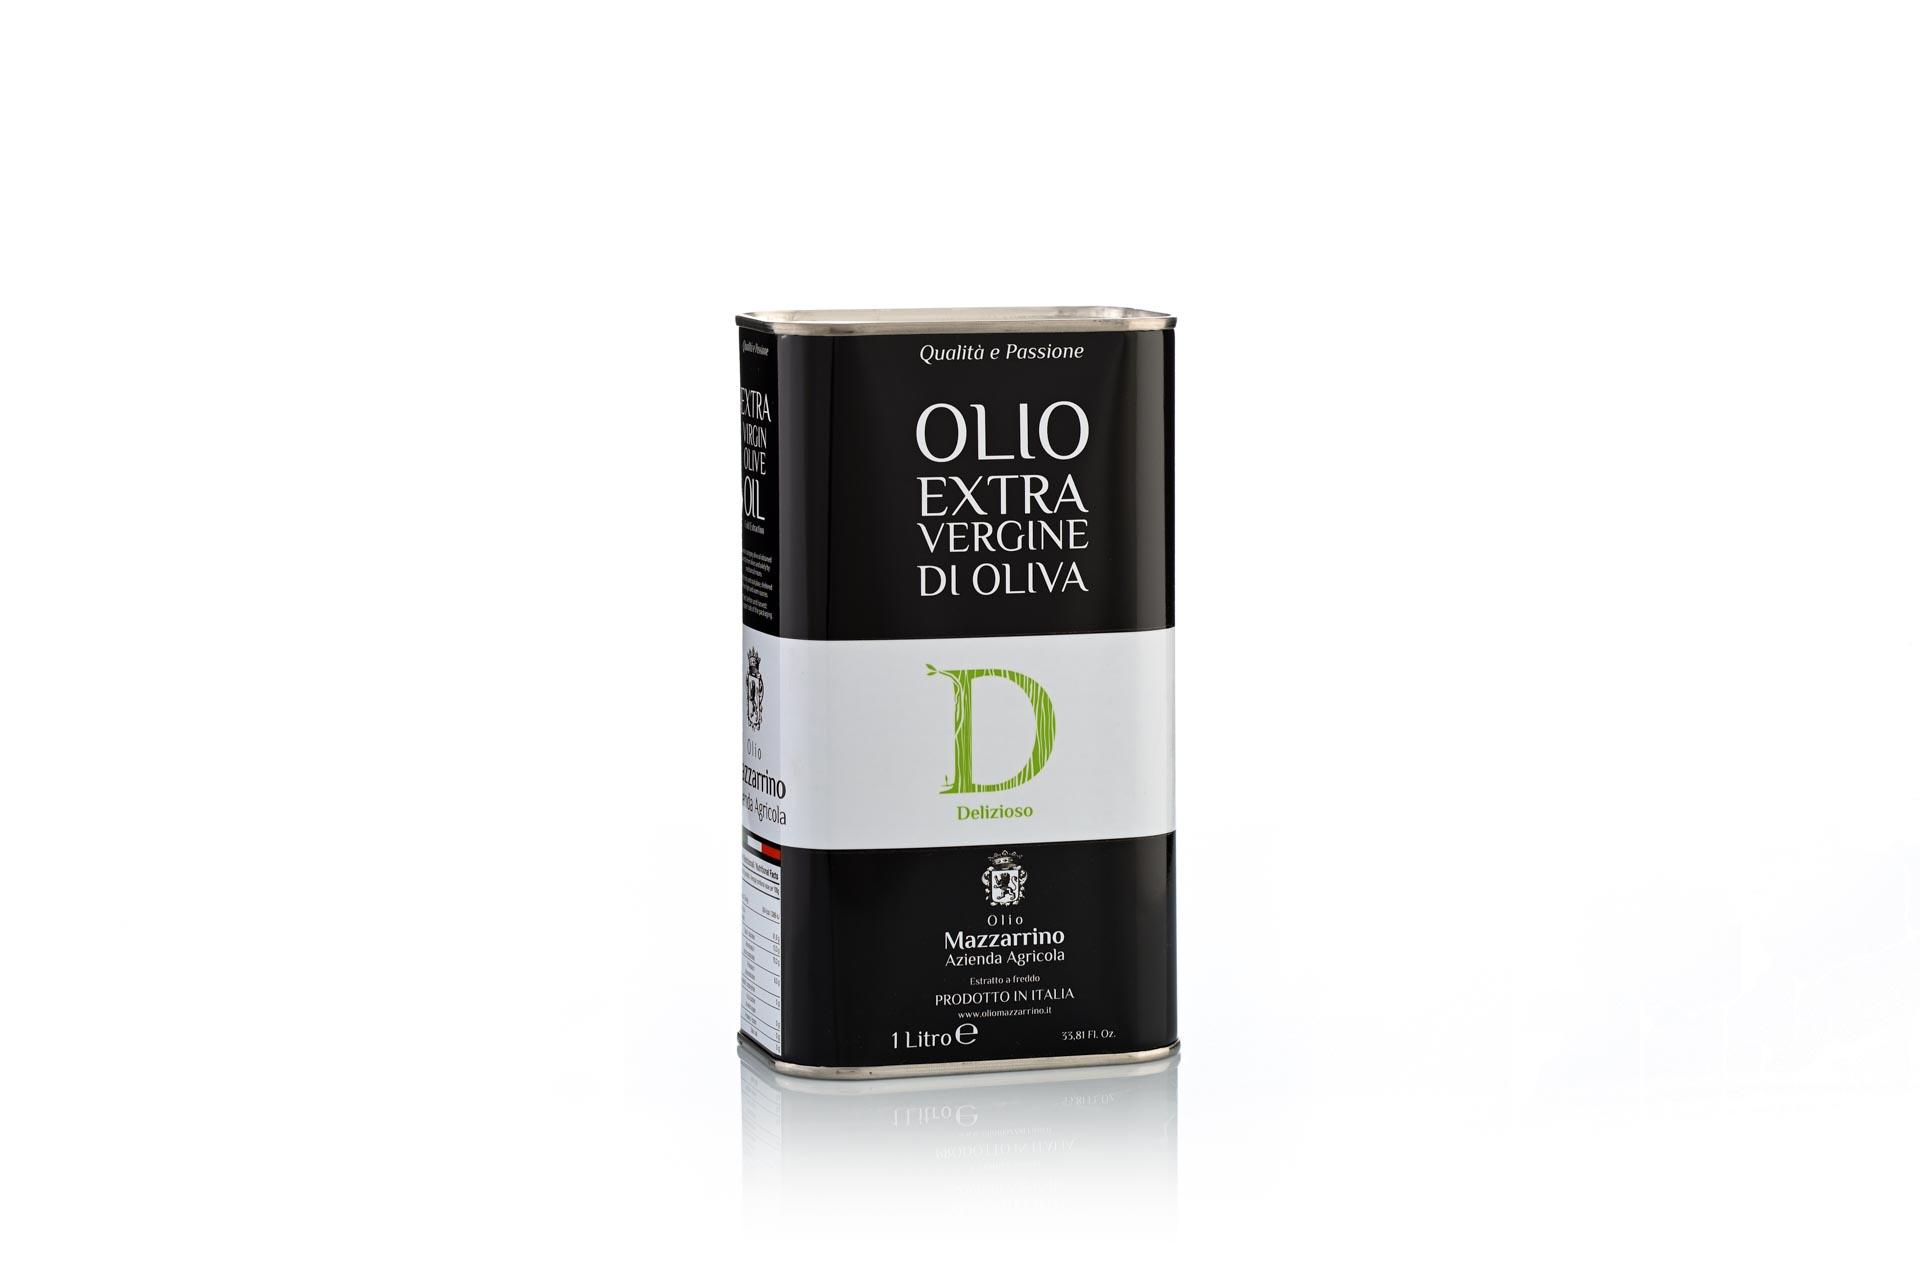 Olio extravergine di oliva DELIZIOSO – 6 lattine da 1 litro